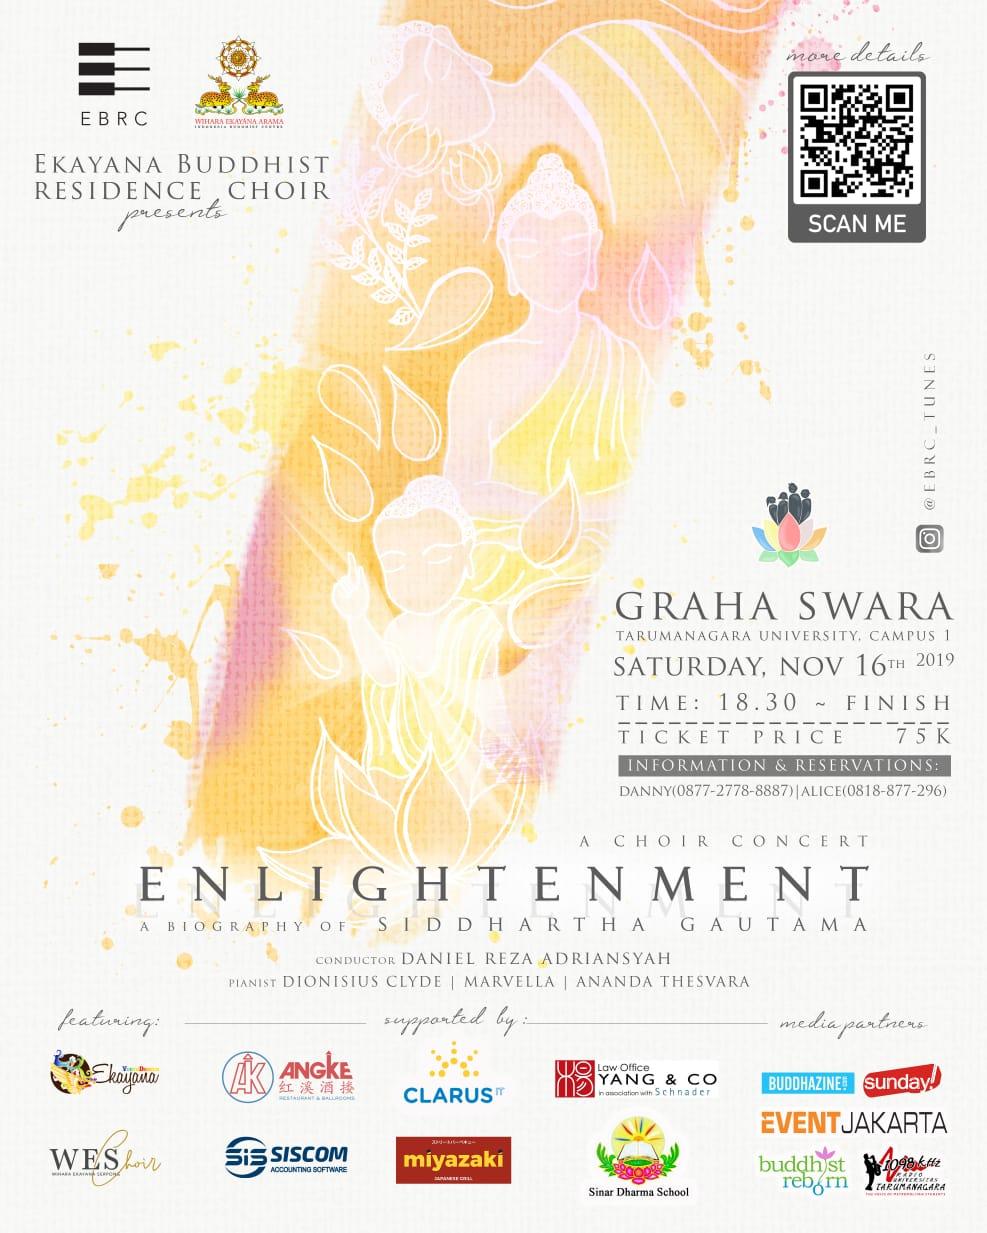 Elightenment A Biography of Siddhartha Gautama